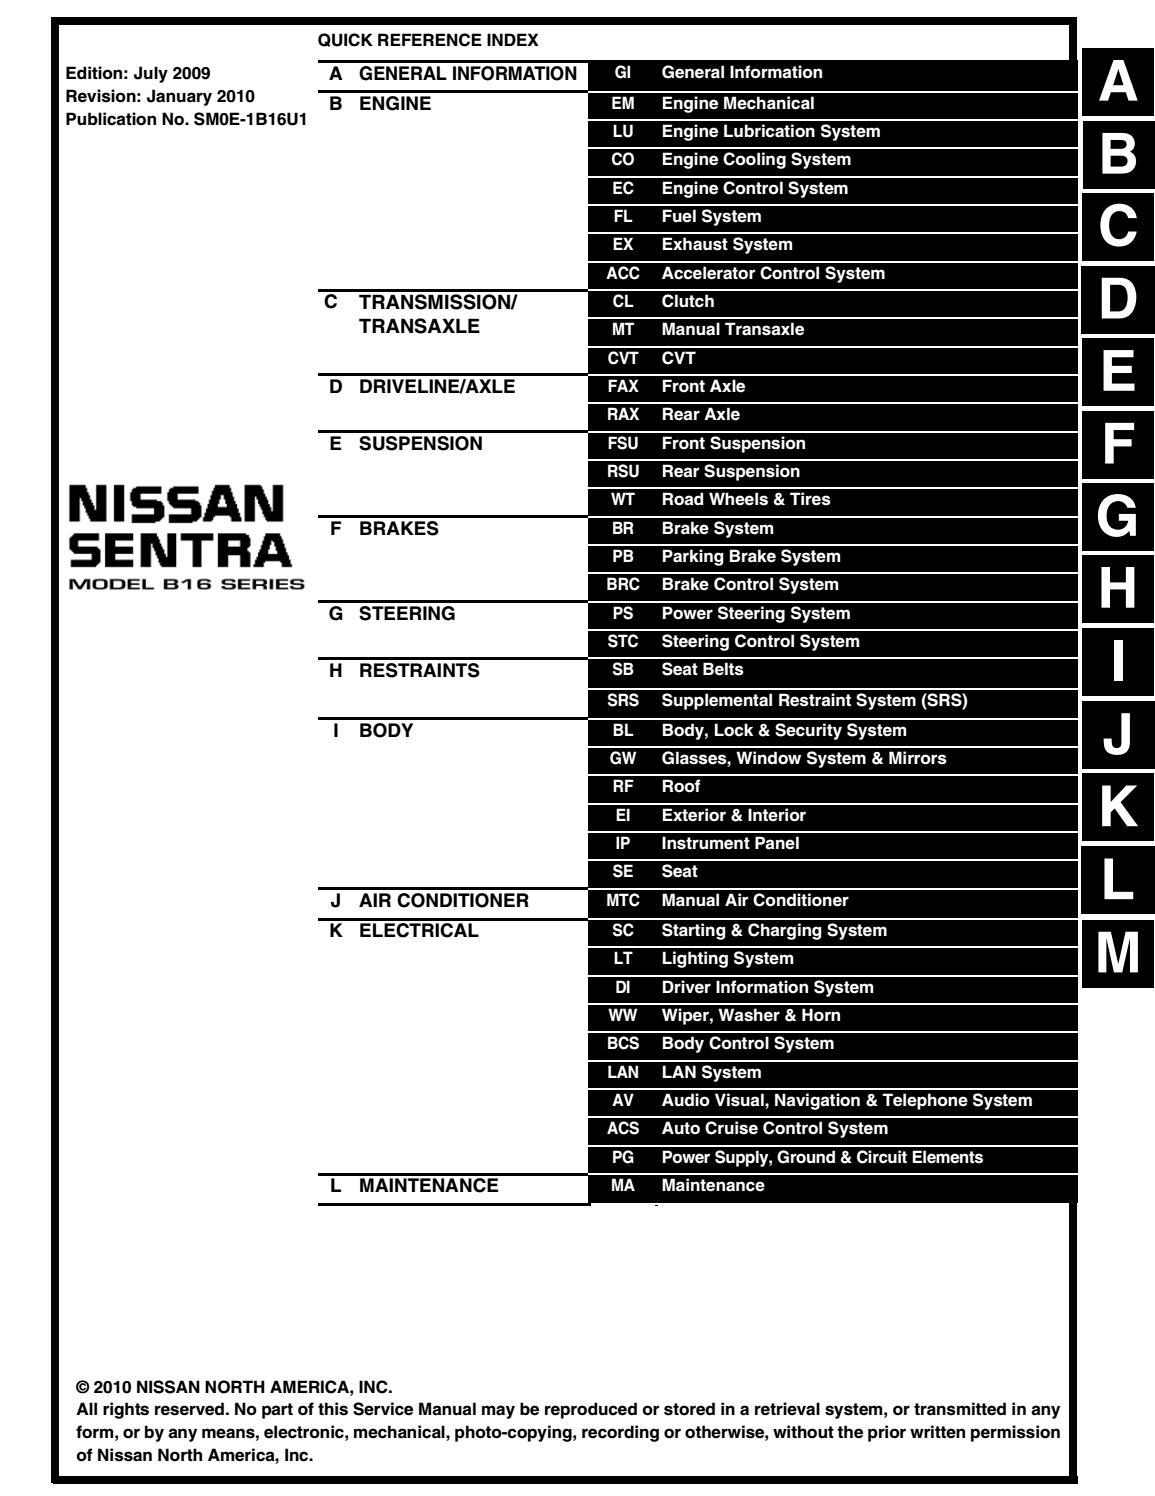 2010 Nissan Sentra Service Repair Manual By 1632310101 Issuu